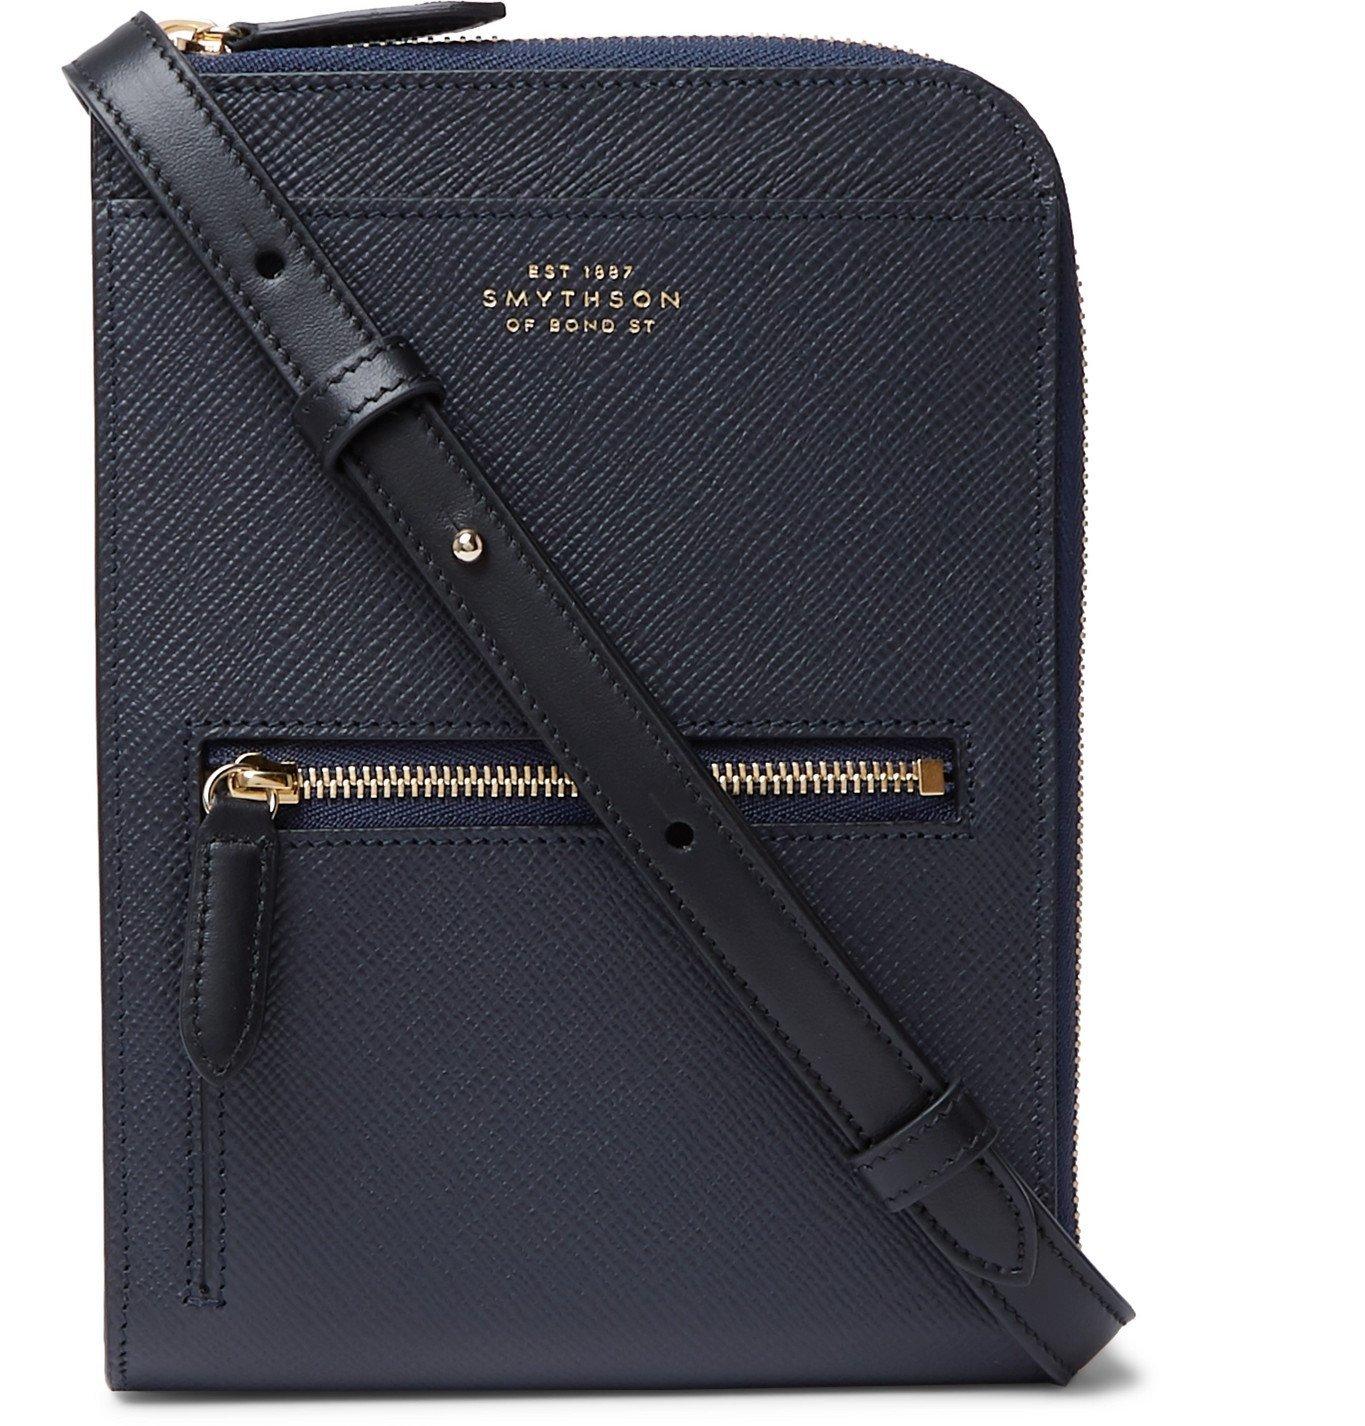 Smythson - Panama Cross-Grain Leather Currency Wallet - Blue